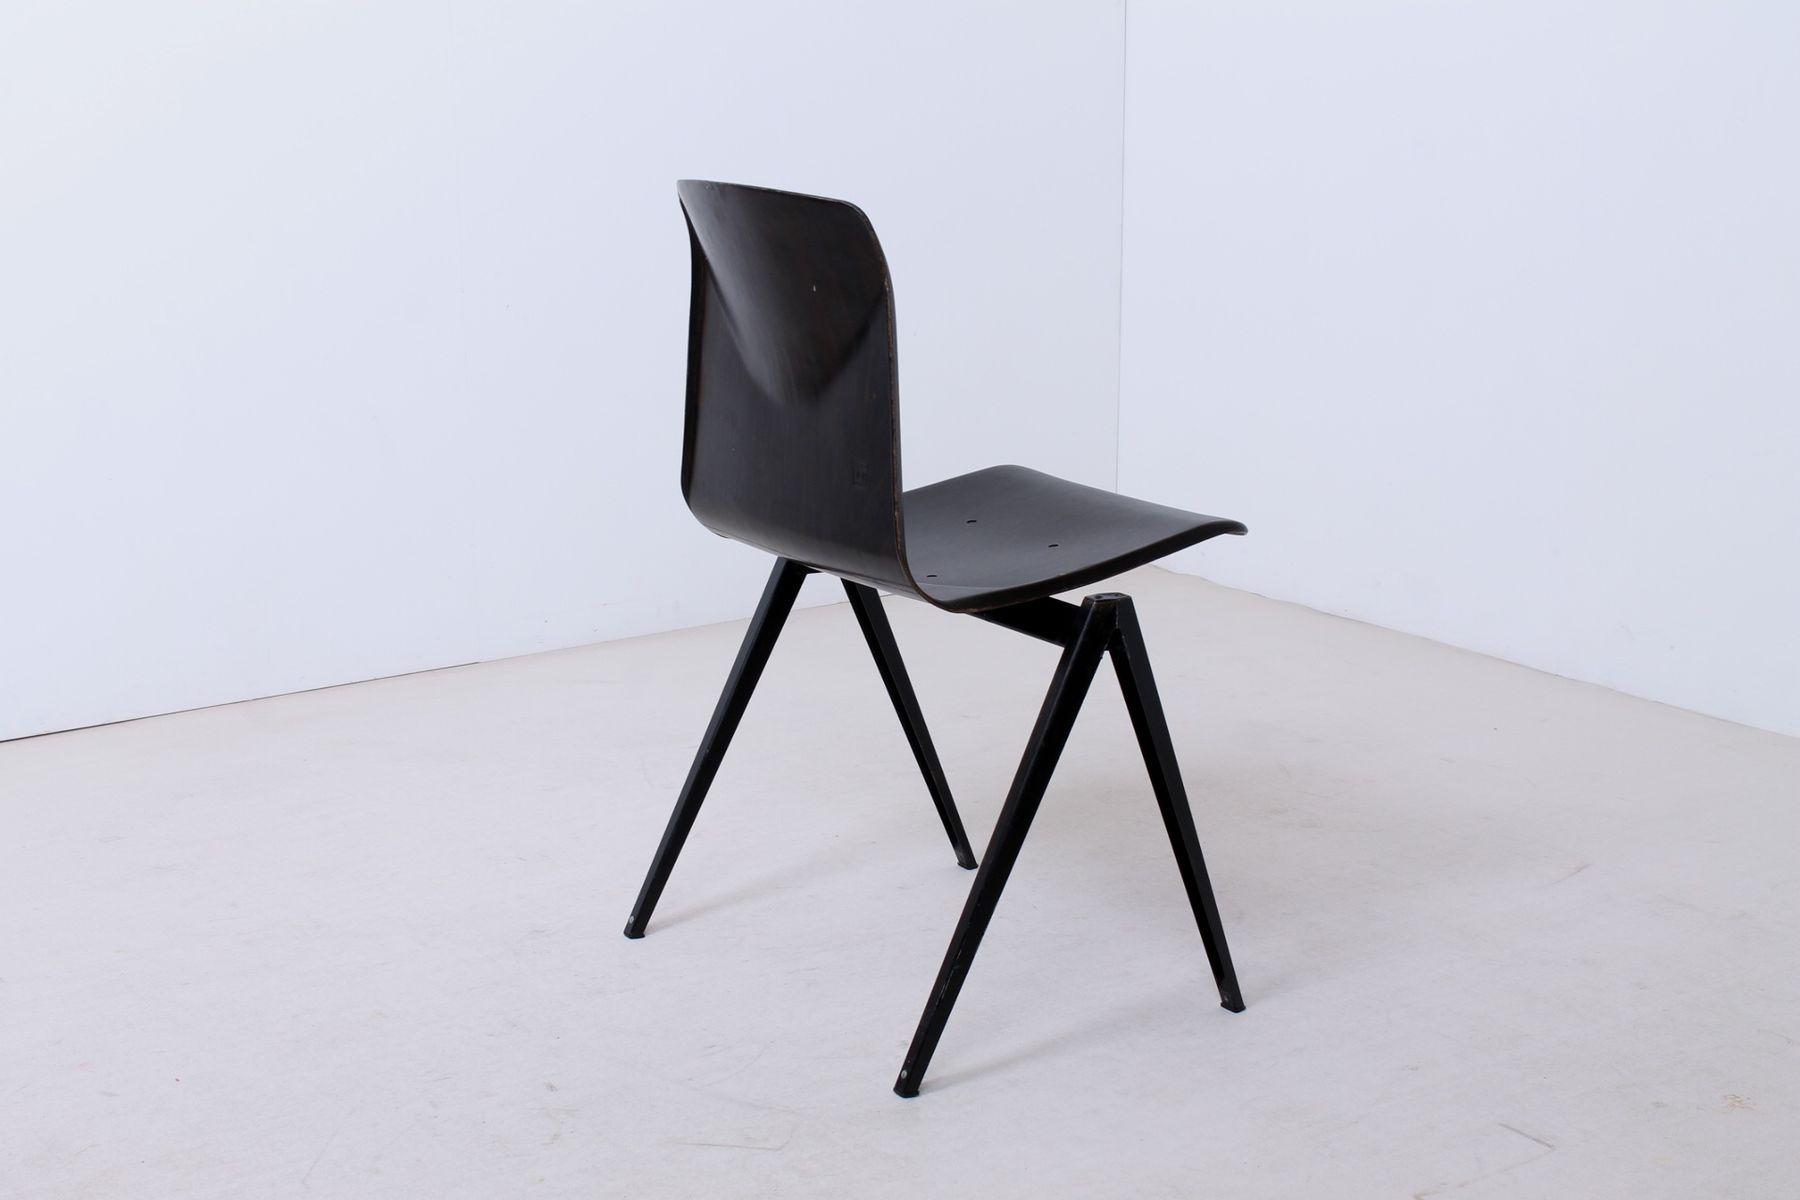 schwarze s 22 thur op seat st hle von galvanitas 1960er 6er set bei pamono kaufen. Black Bedroom Furniture Sets. Home Design Ideas